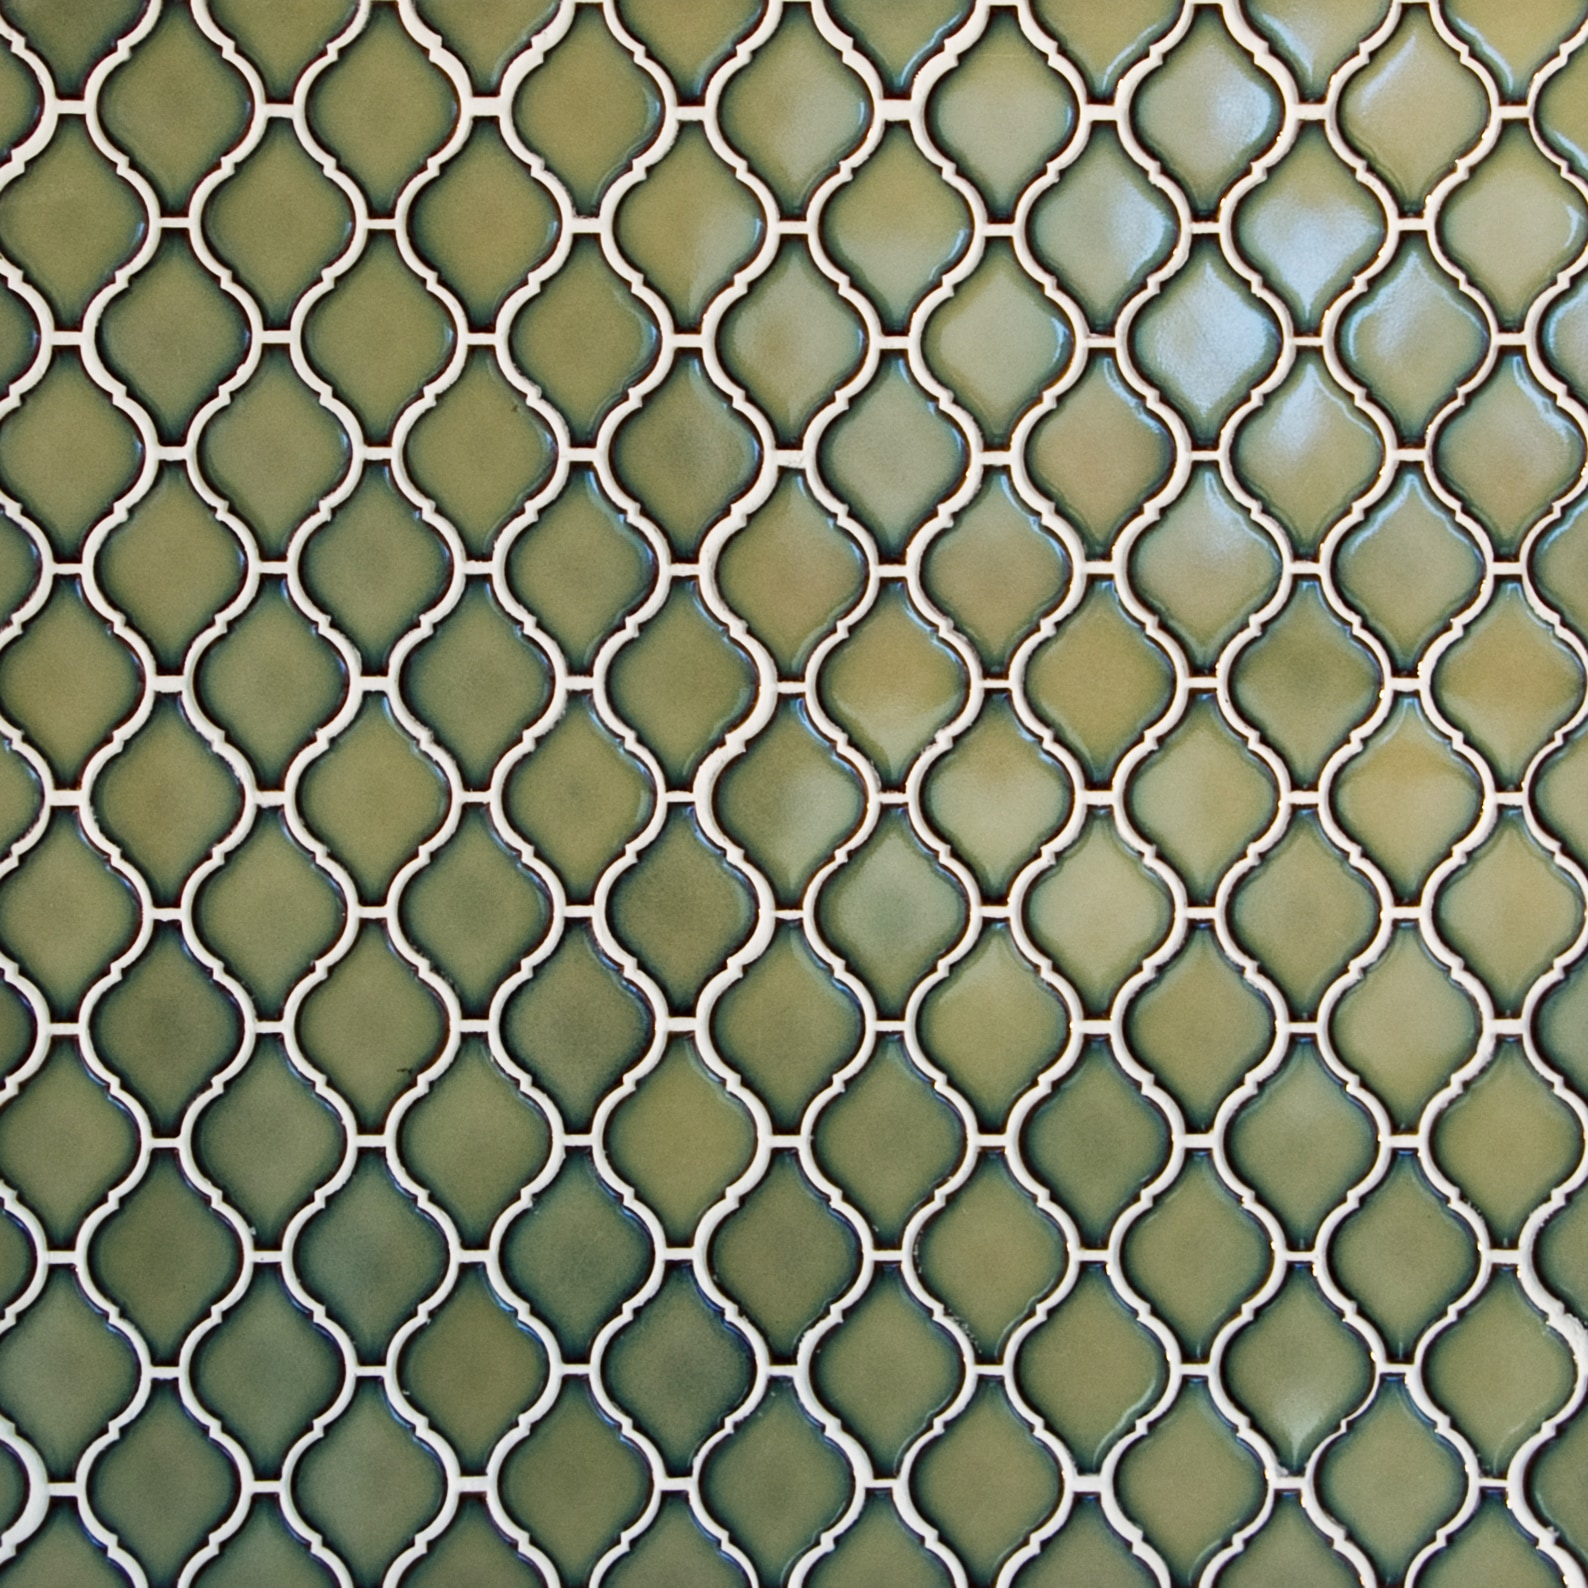 "Moss Green, Narrow Pattern / 2.75""x2"" / Glossy Arabesque Lantern Mosaics 0"